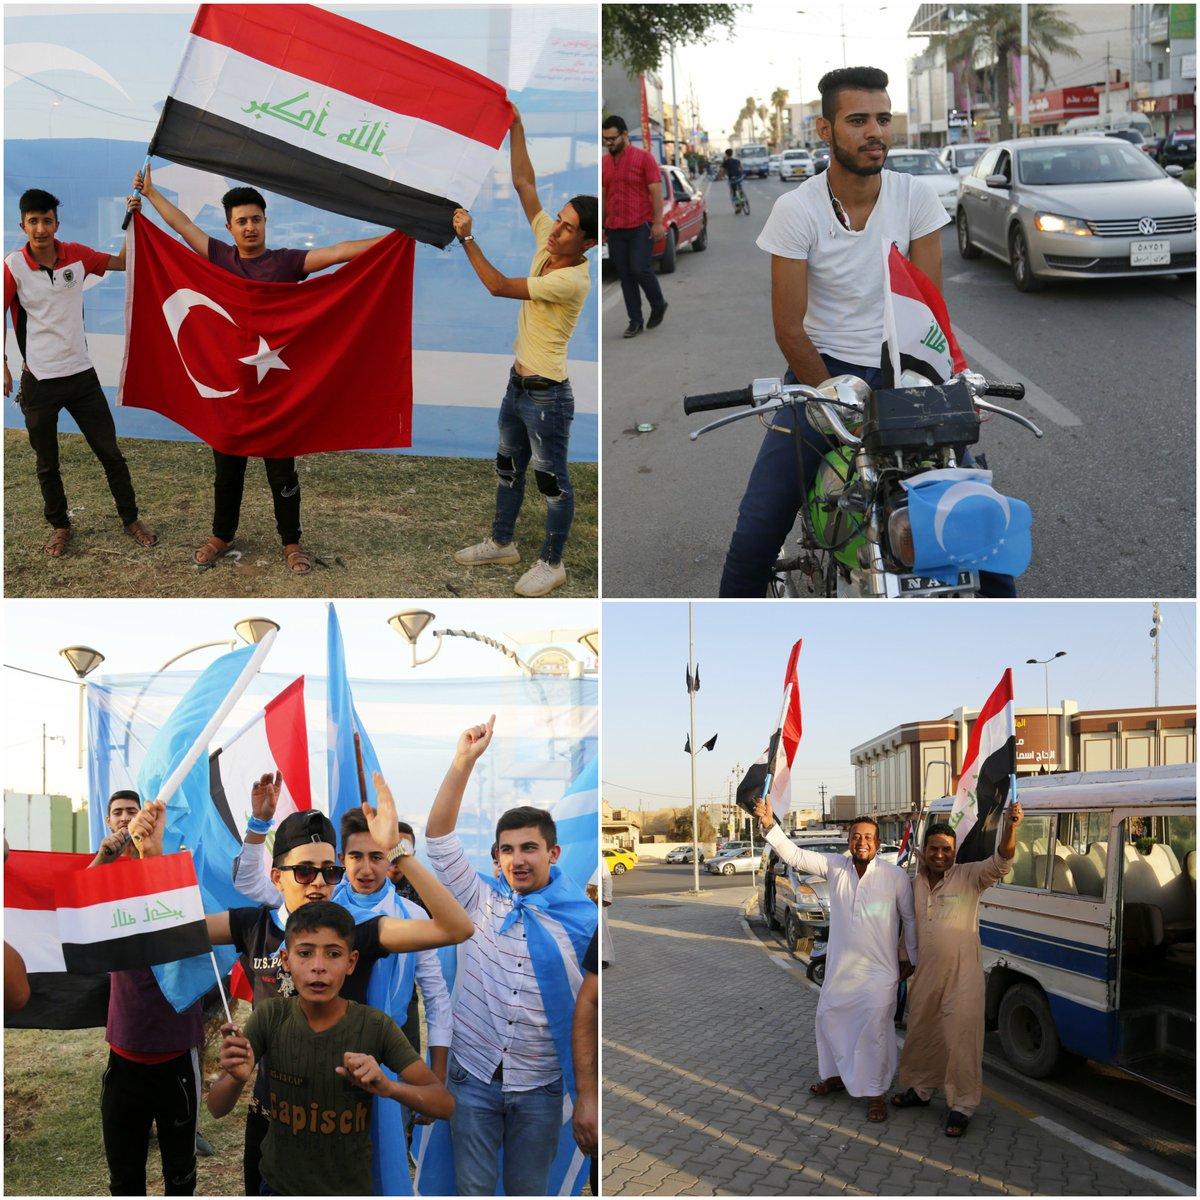 #Kirkuk #celebrates after #Iraqi forces...